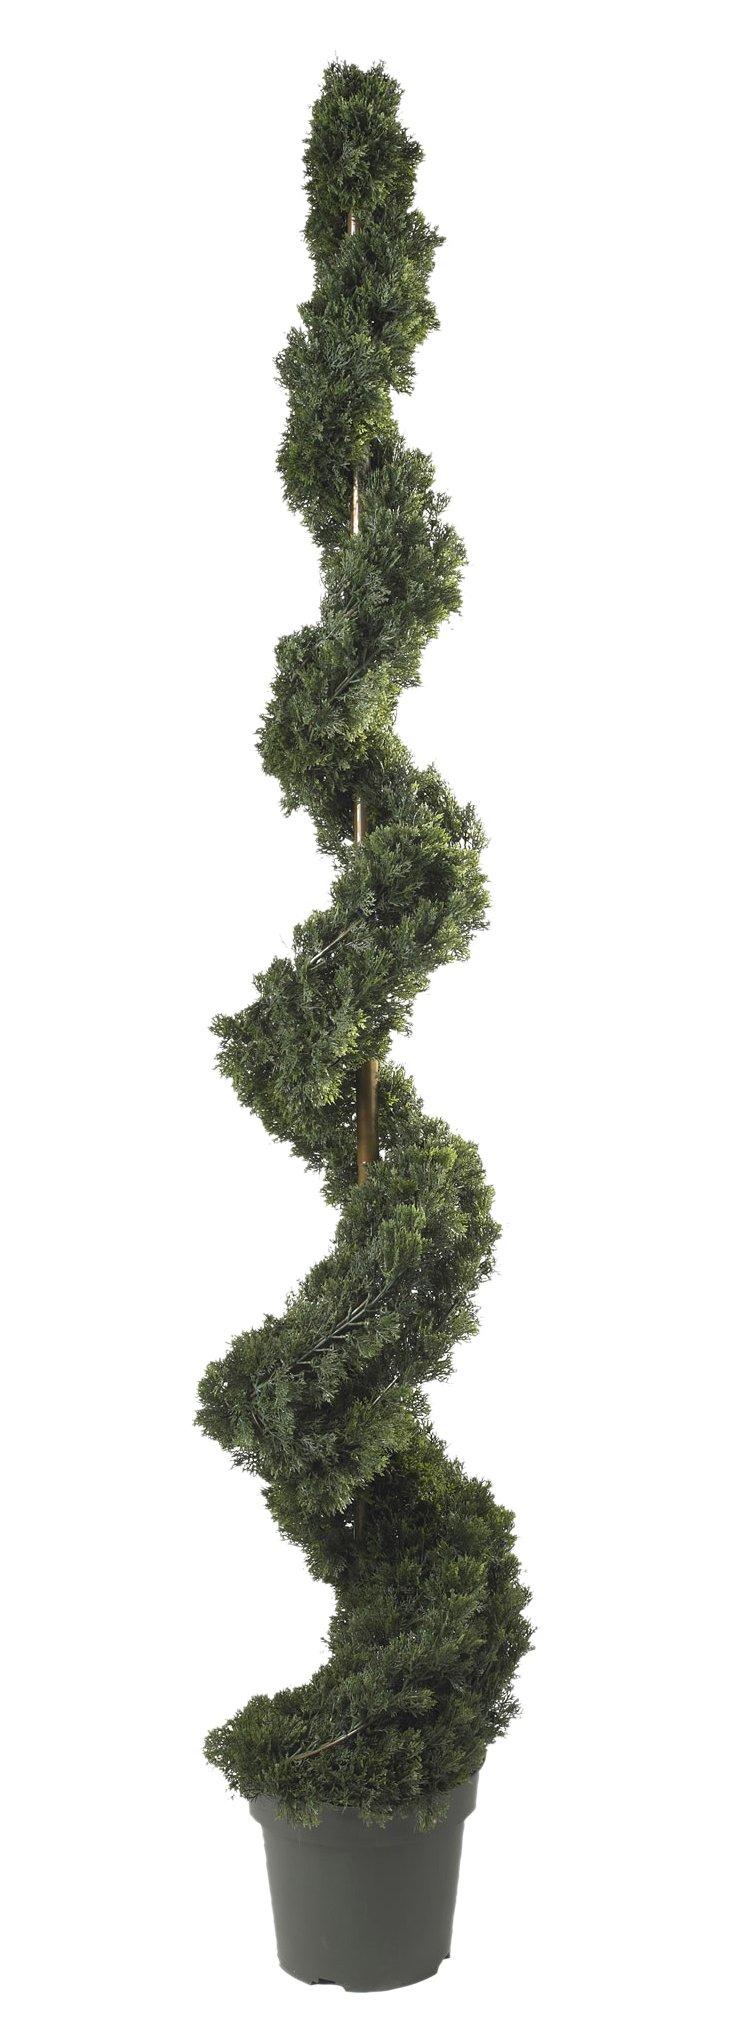 6' Spiral Cedar Tree, Faux